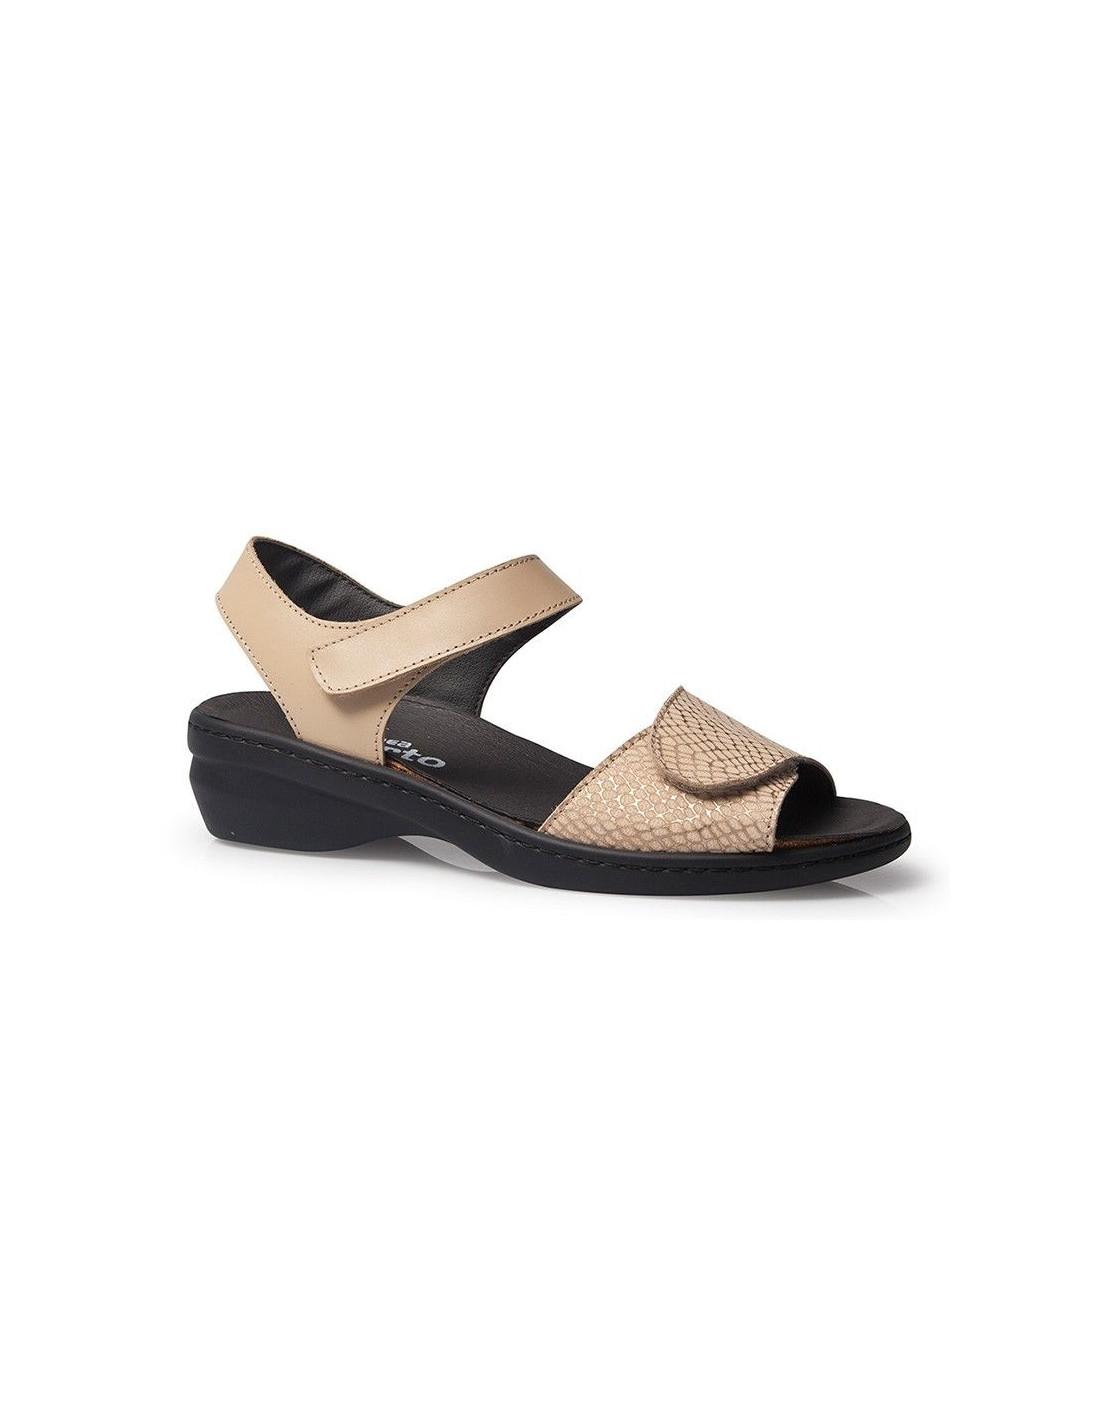 Plantilla Sandalia Extraíble Velcros Con Y Orto De Calzamedi wP0OknX8